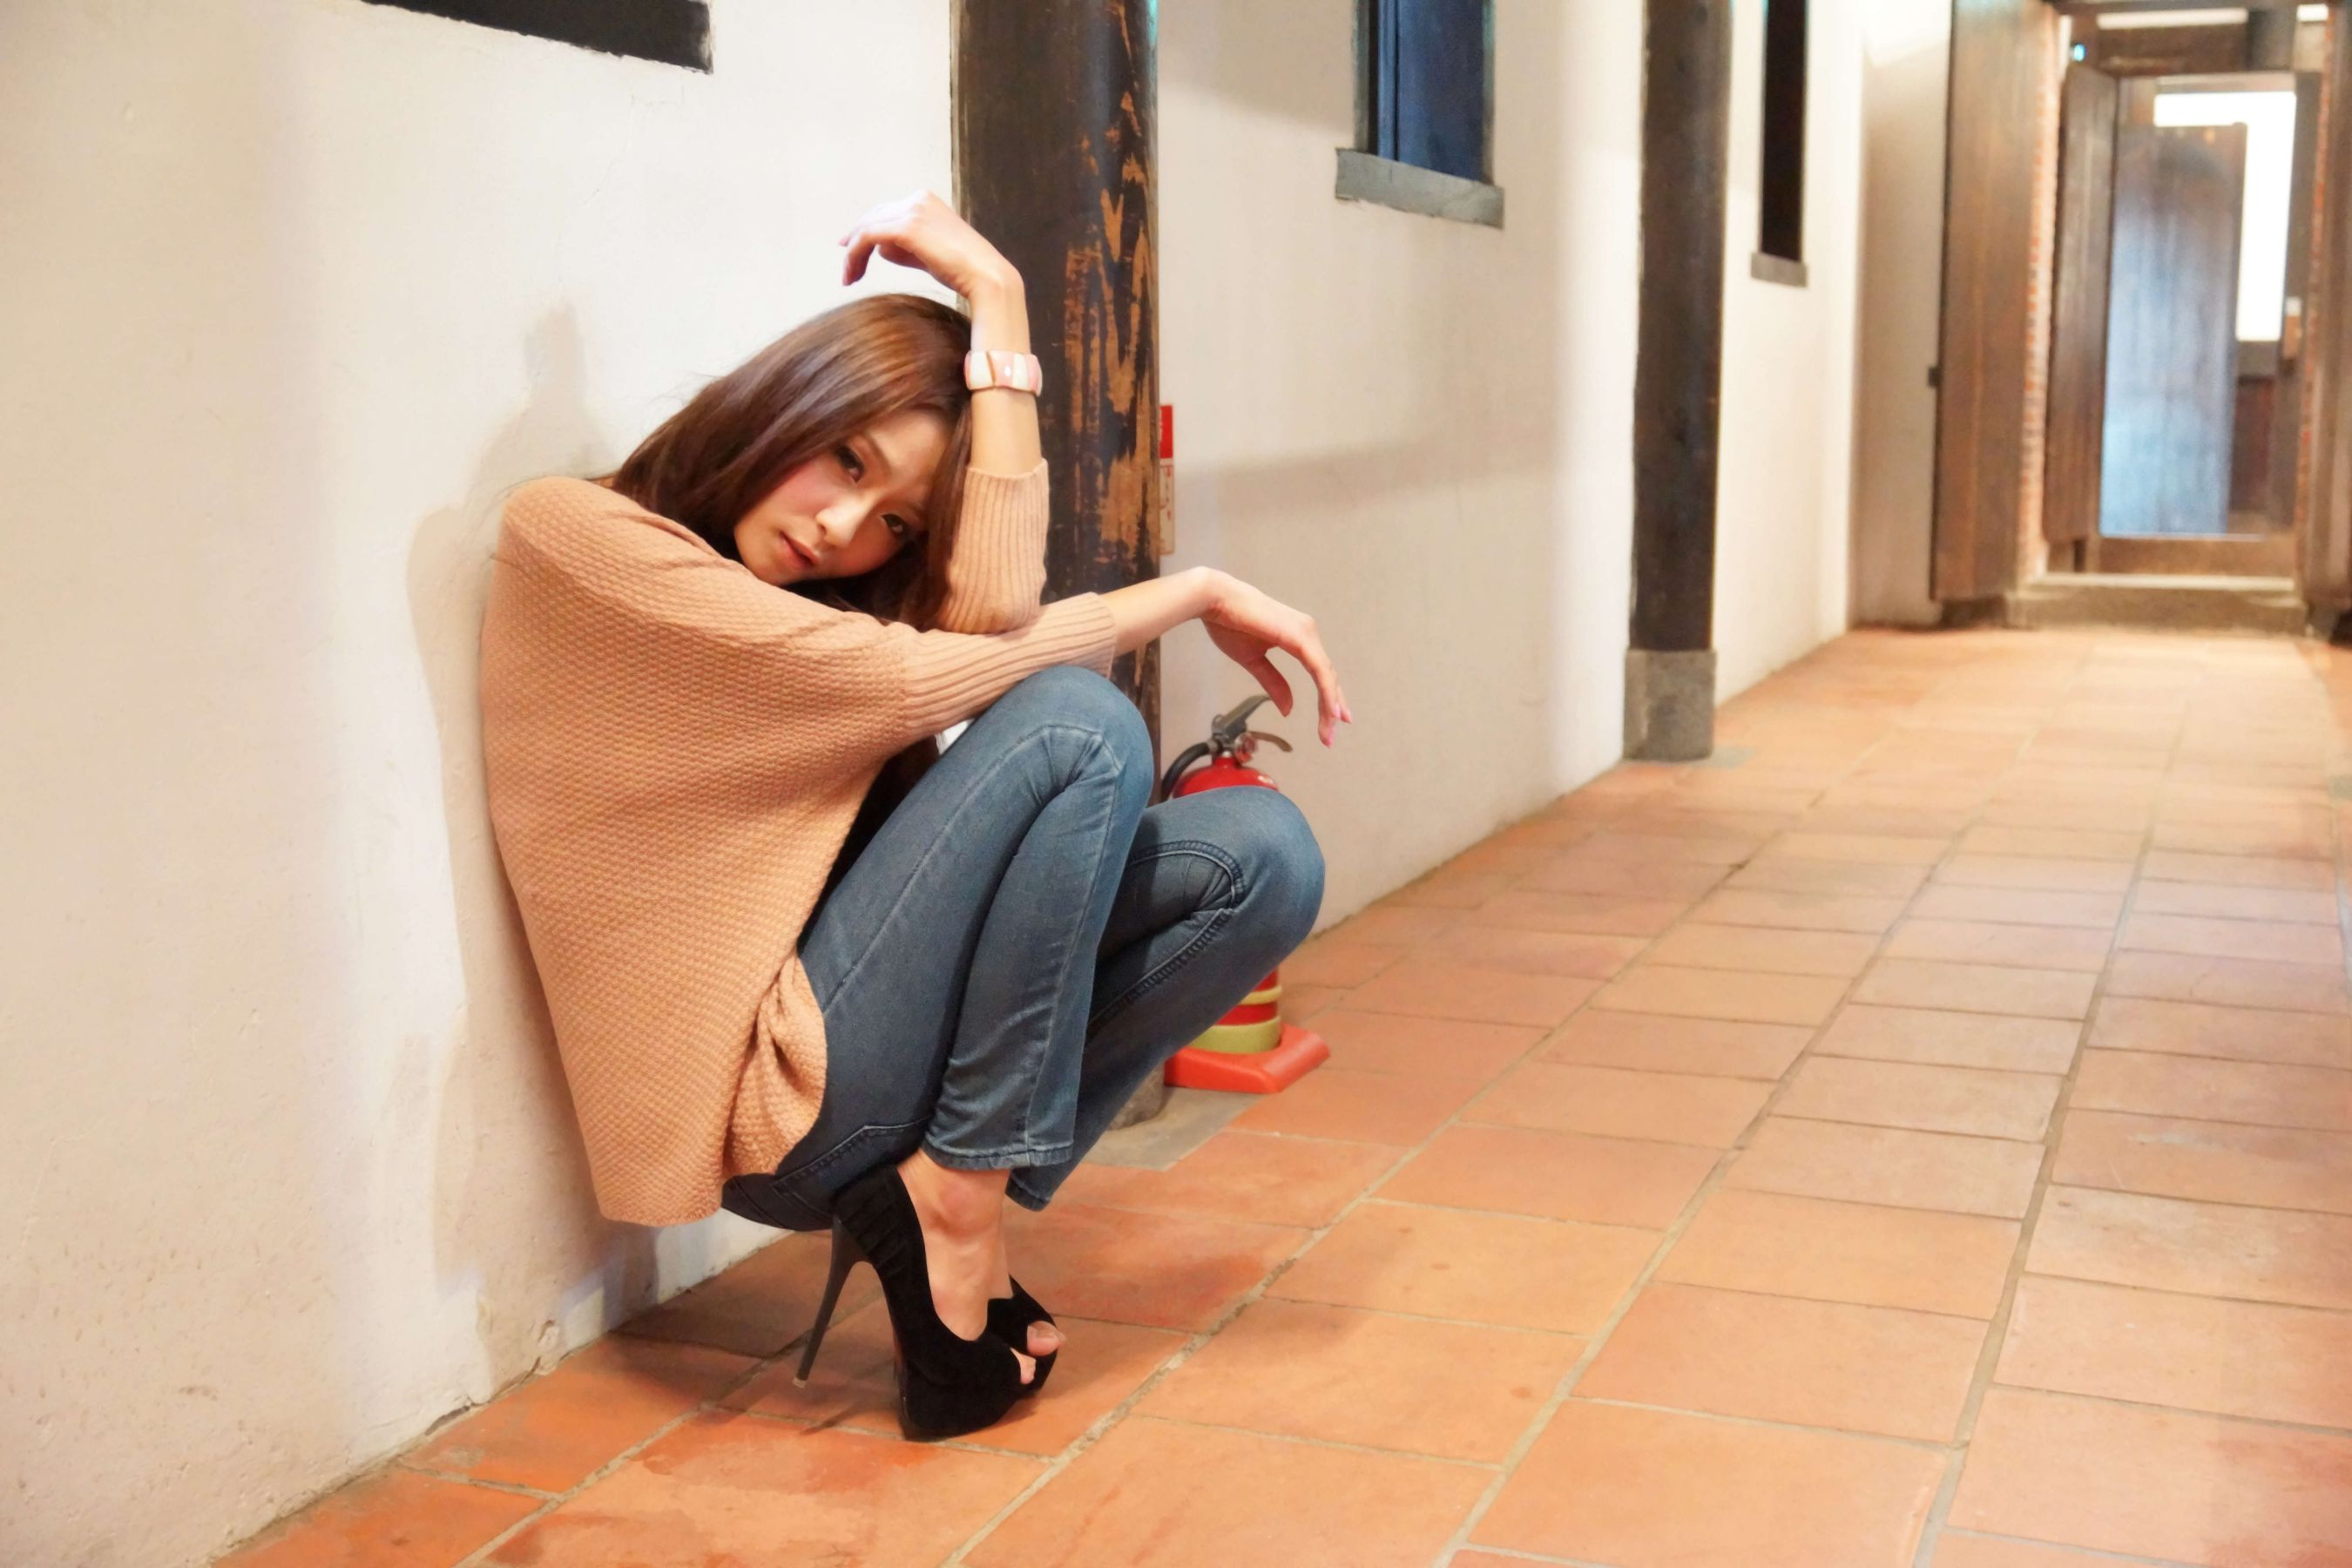 VOL.81 [台湾正妹]清新外拍:Winnie小雪(庄咏惠,庄温妮,腿模Winnie)高品质写真套图(27P)